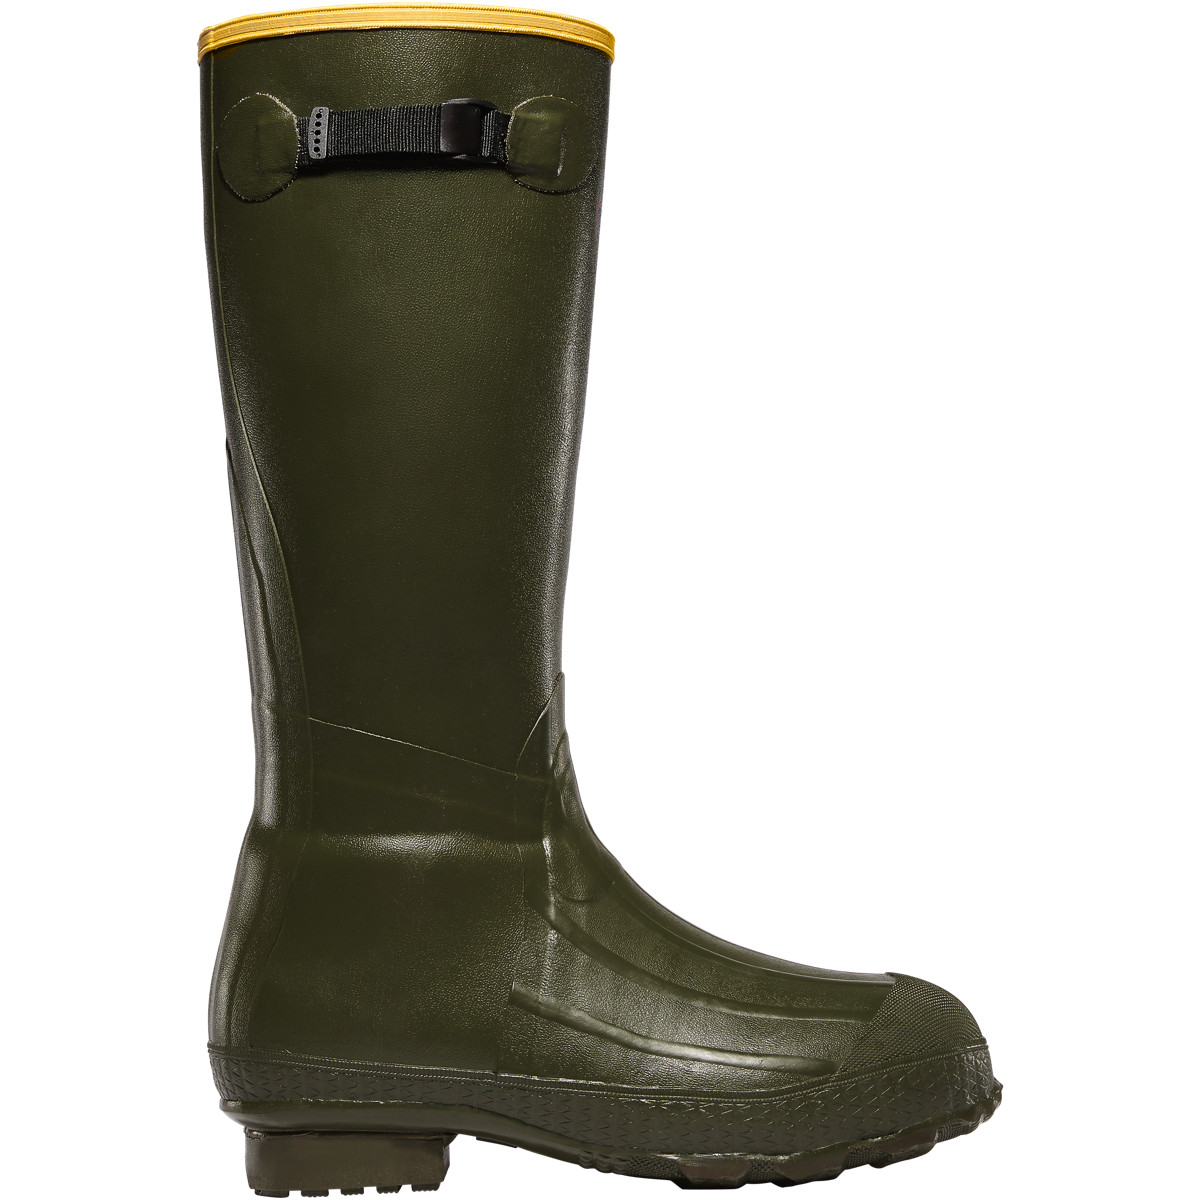 bc31ba56e LaCrosse Footwear - Burly 18